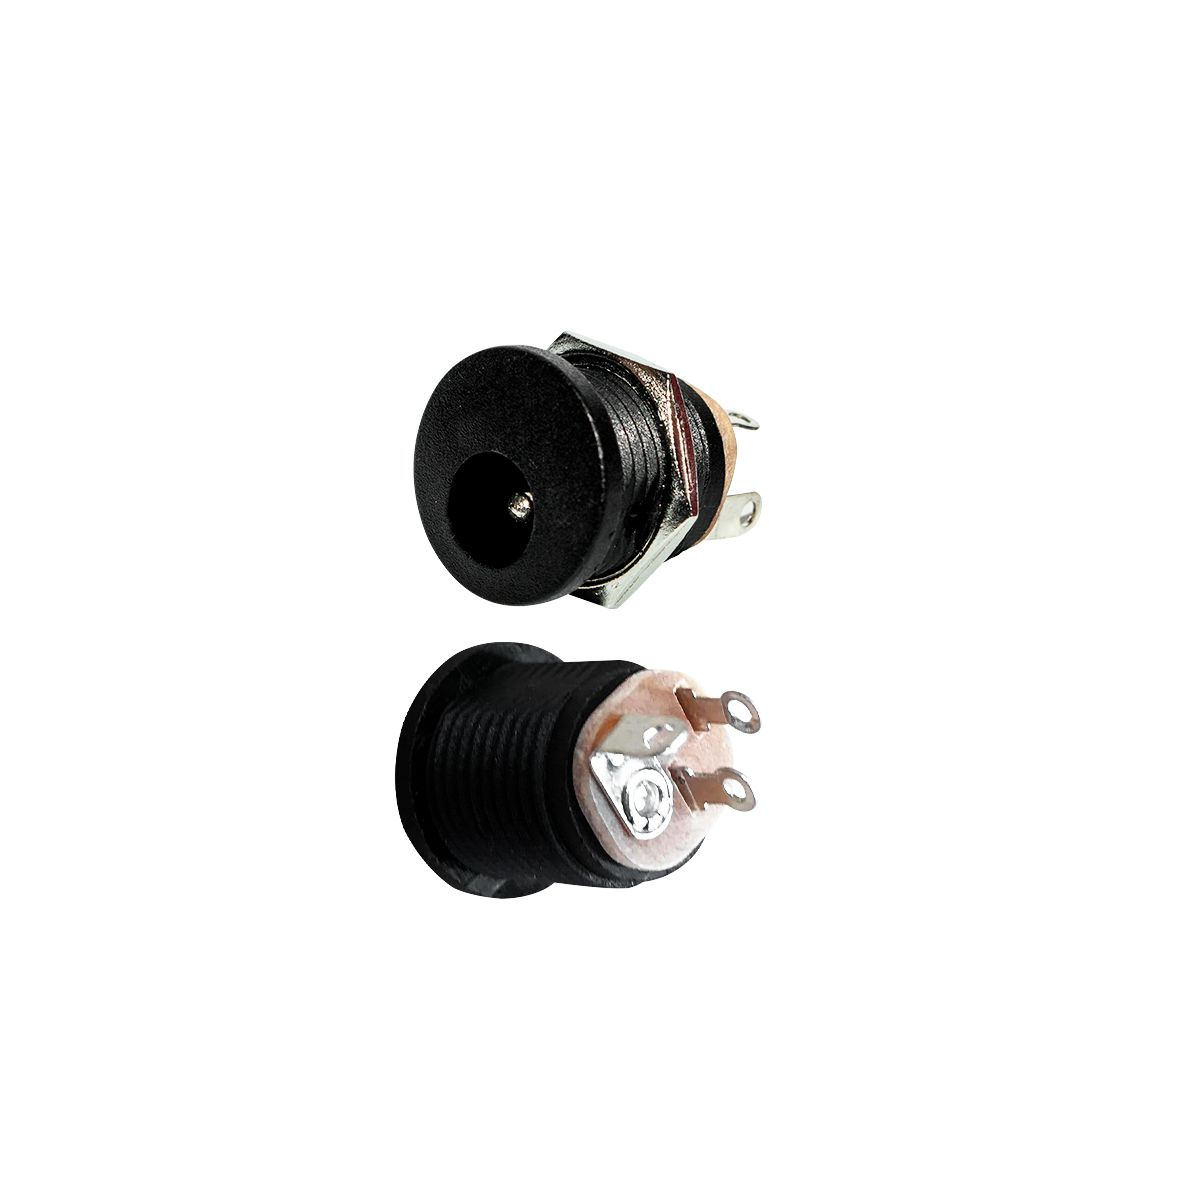 Kit 15 Unidades Conector Plug De Energia P4 Macho + 15 Unidades Plug Jack Tipo P4 Fêmea Com Rosca